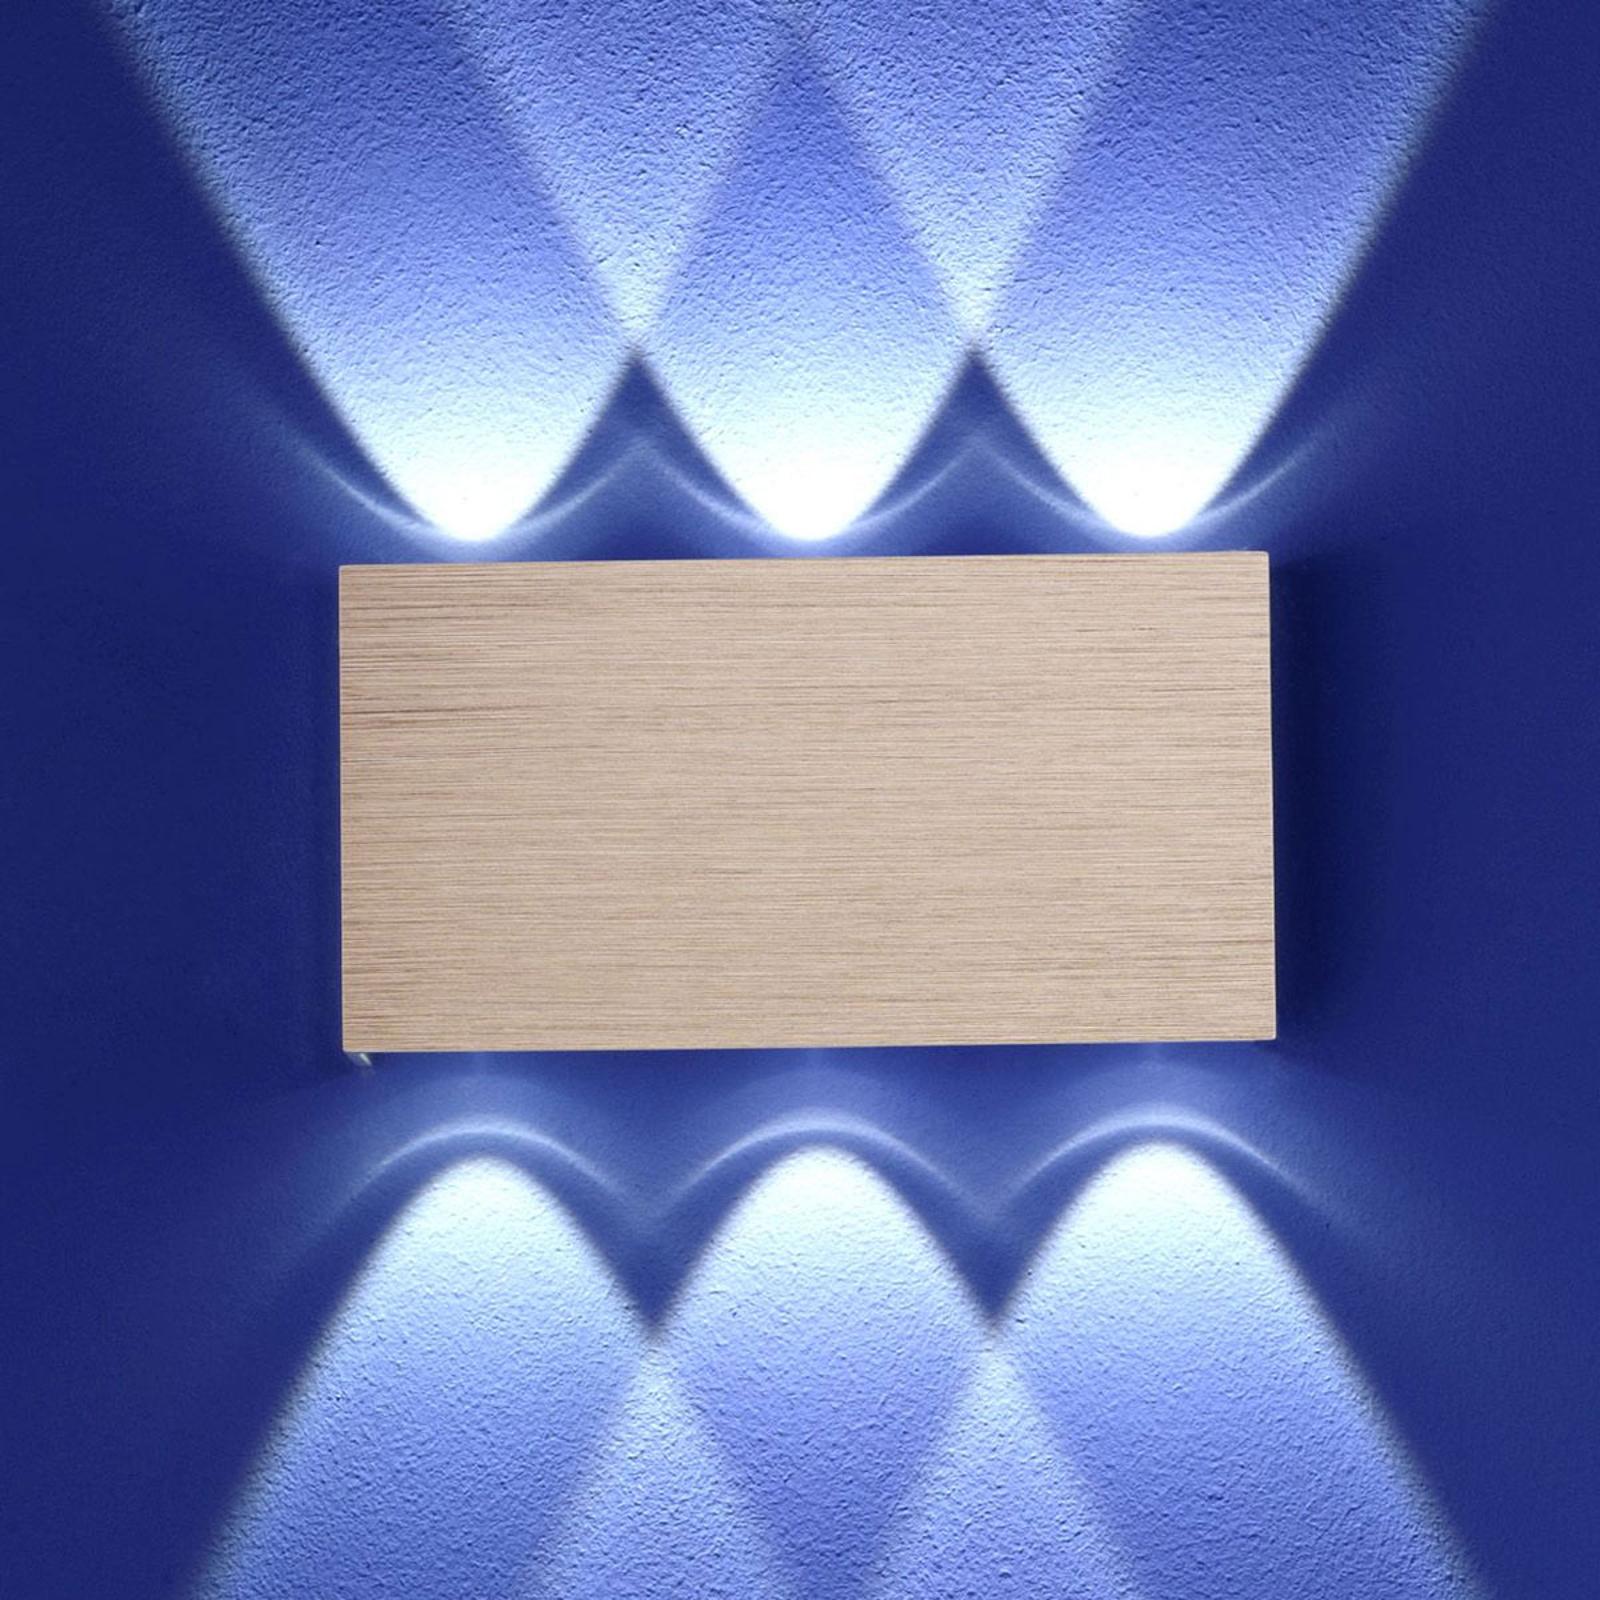 B-Leuchten Stream applique LED or rose